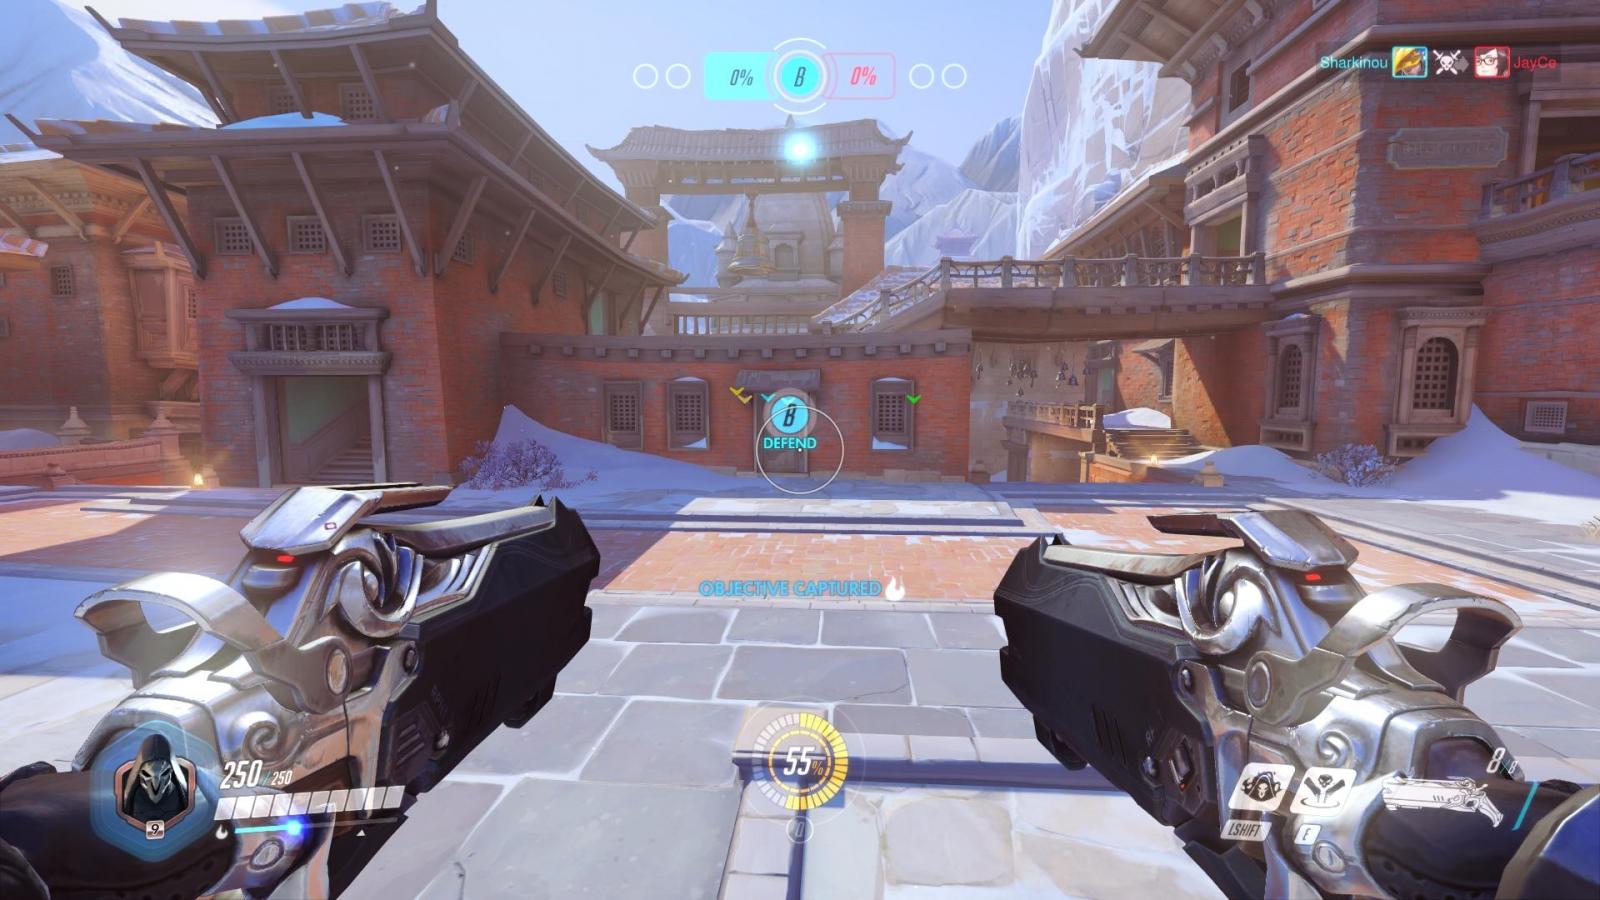 Overwatch screenshot PC